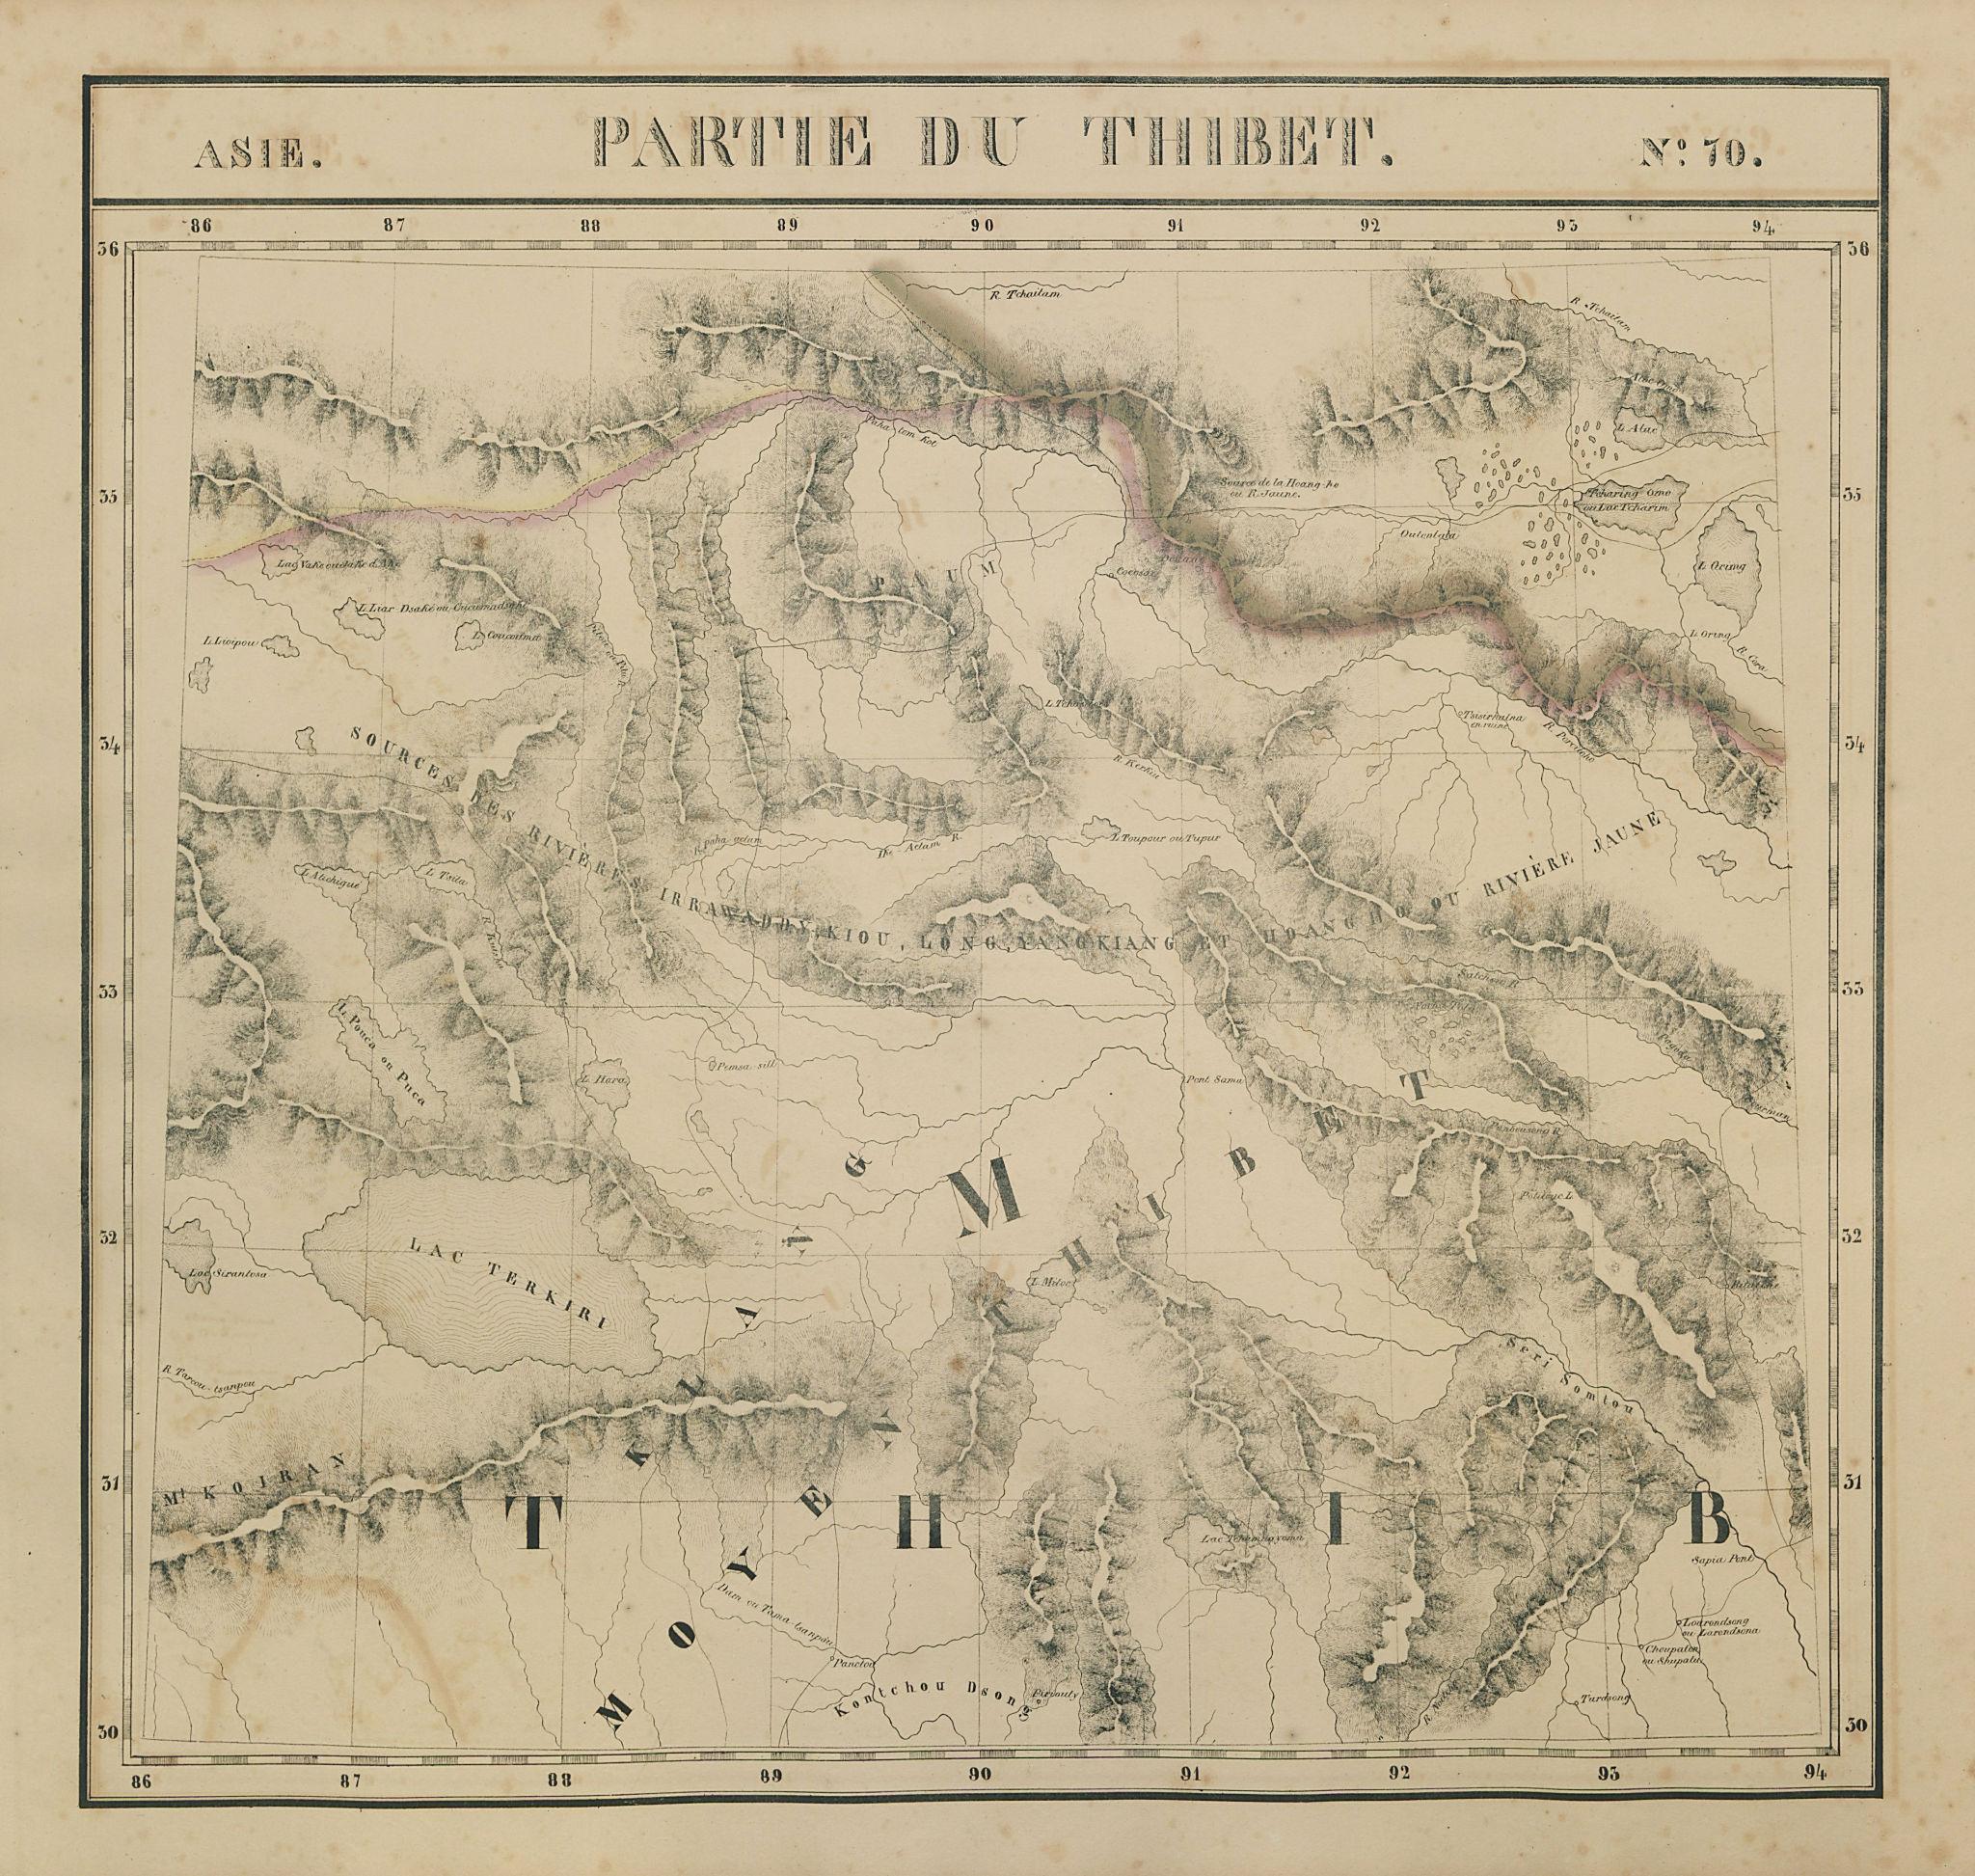 Asie. Partie du Thibet #70 NE Tibet & SW Qinghai. China. VANDERMAELEN 1827 map